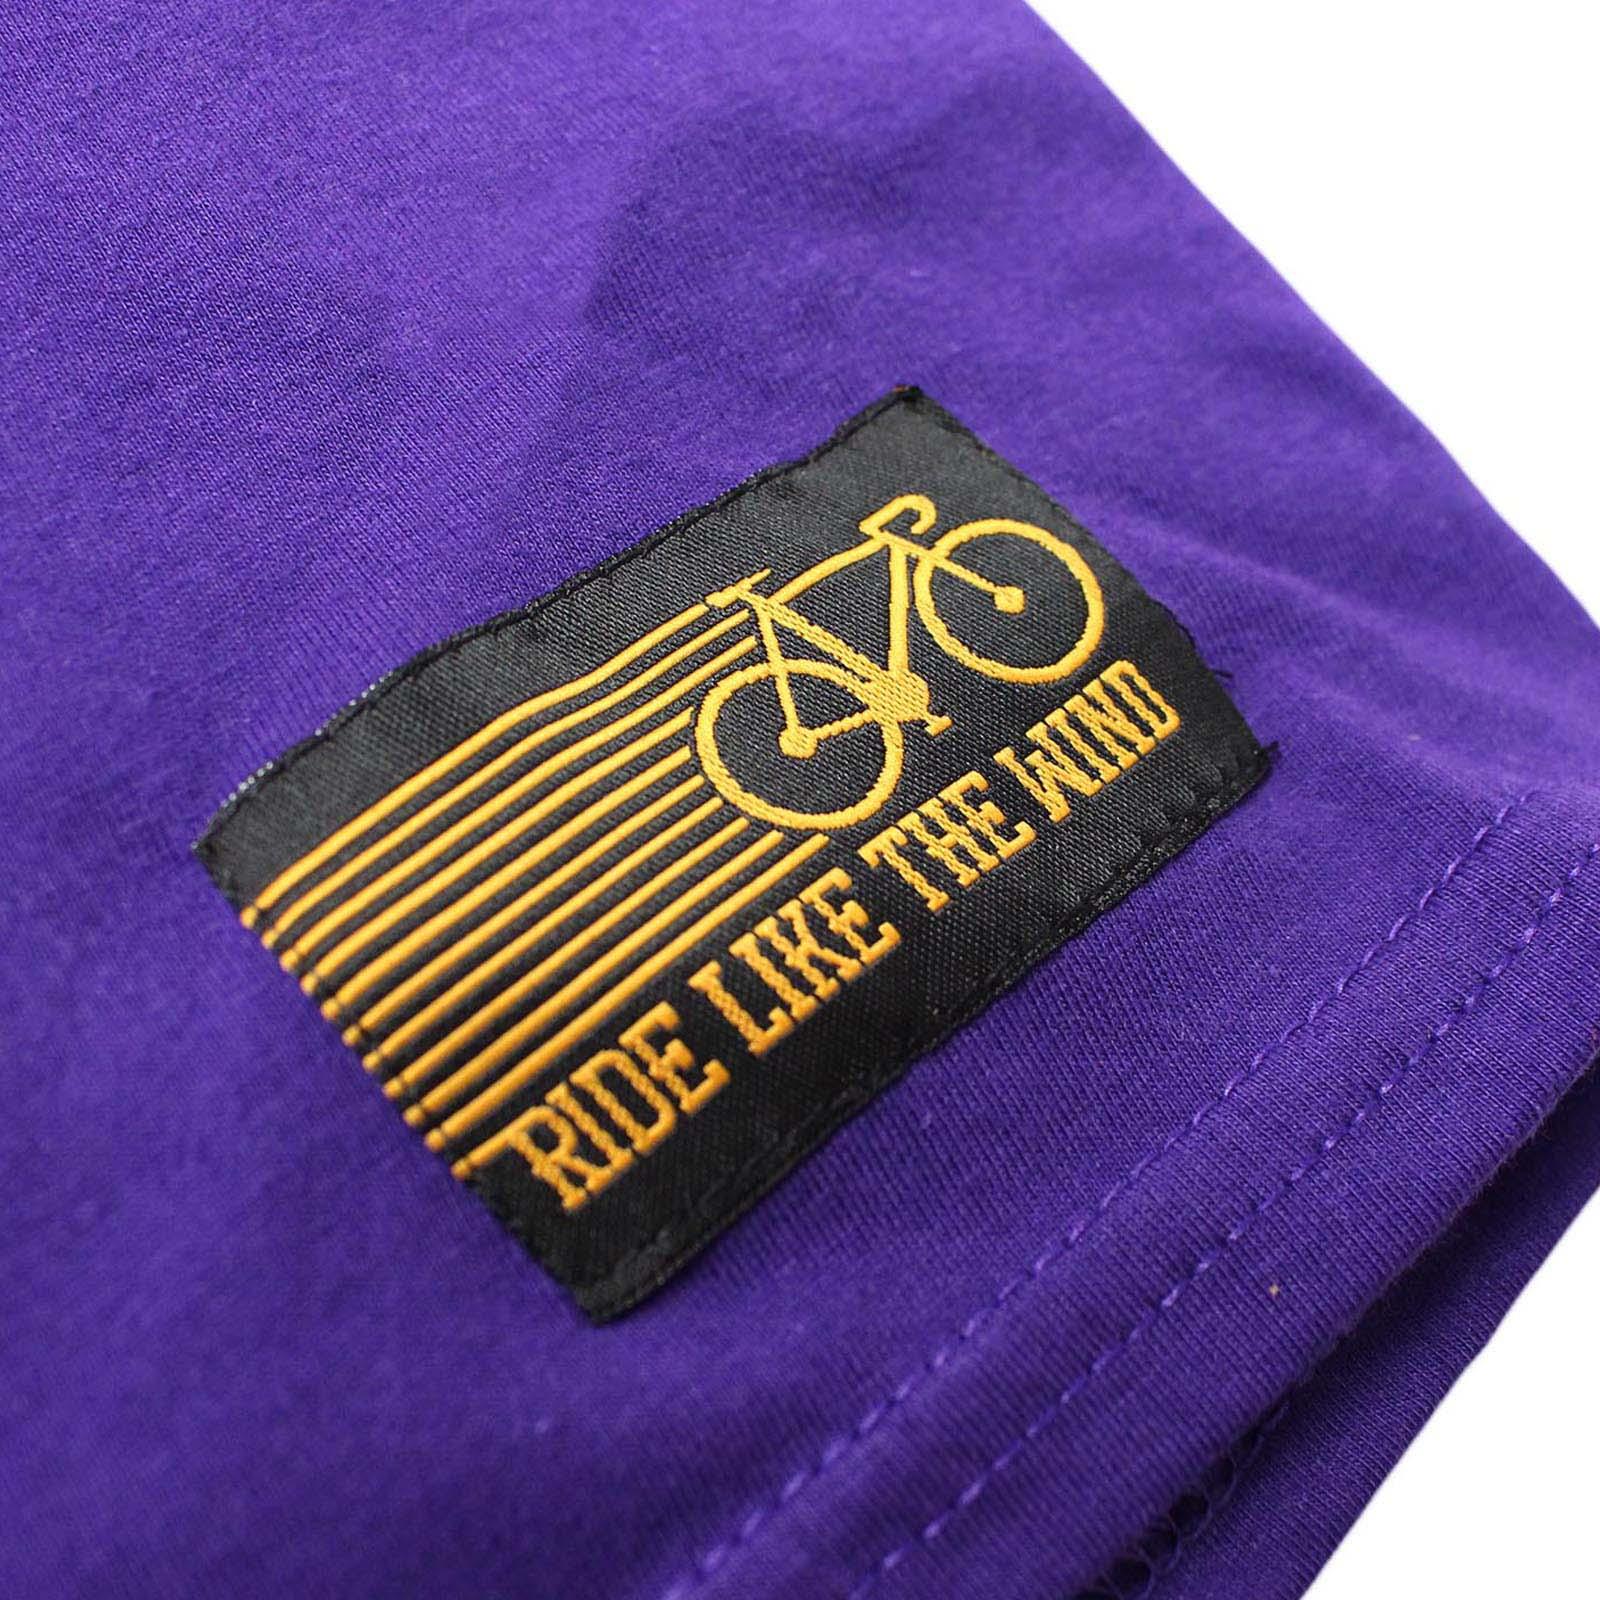 Cycling-T-Shirt-Funny-Novelty-Mens-tee-TShirt-Bike-Part-Words thumbnail 24